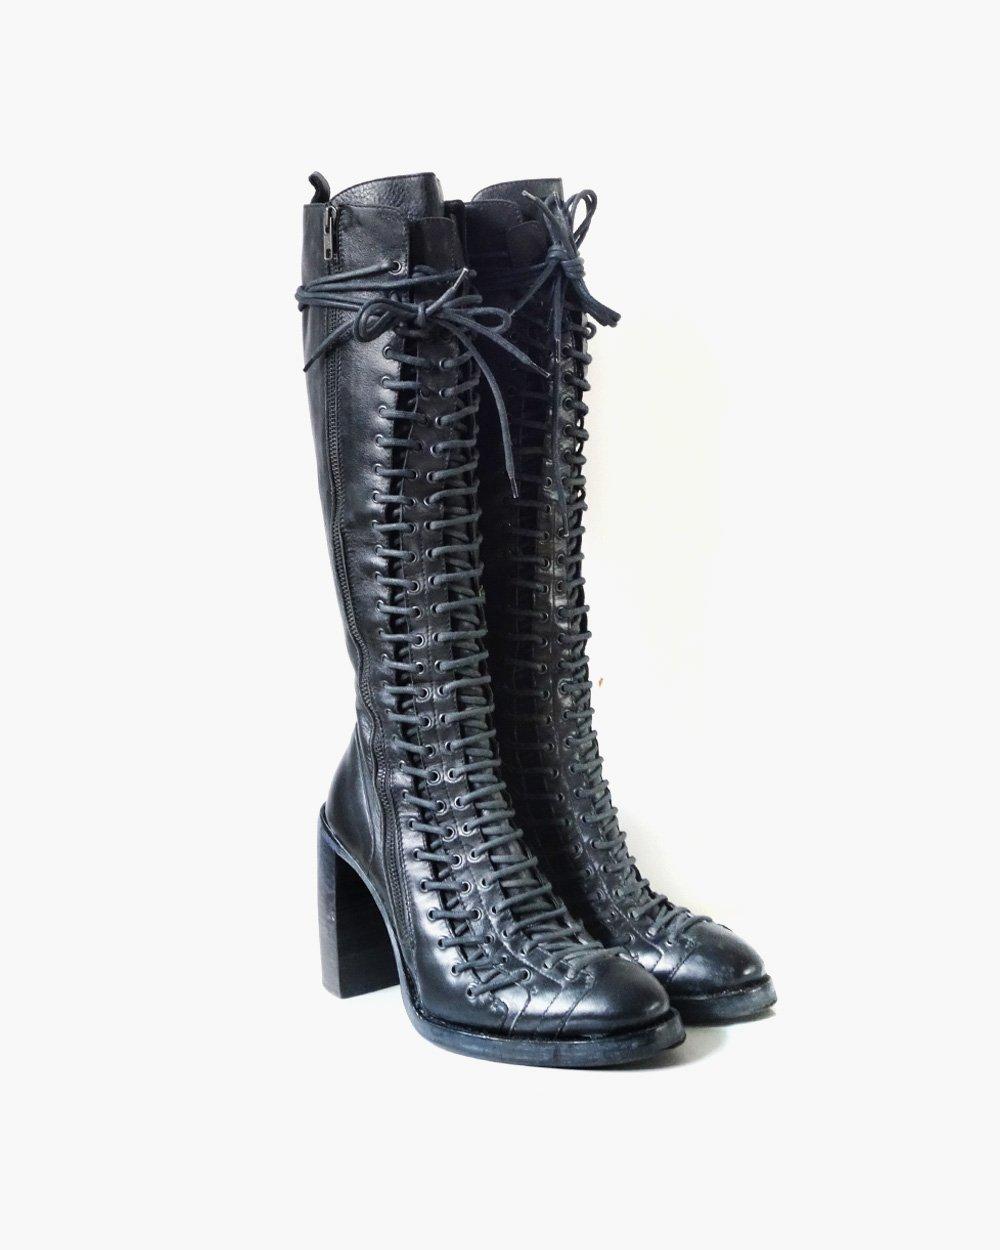 Boots talon